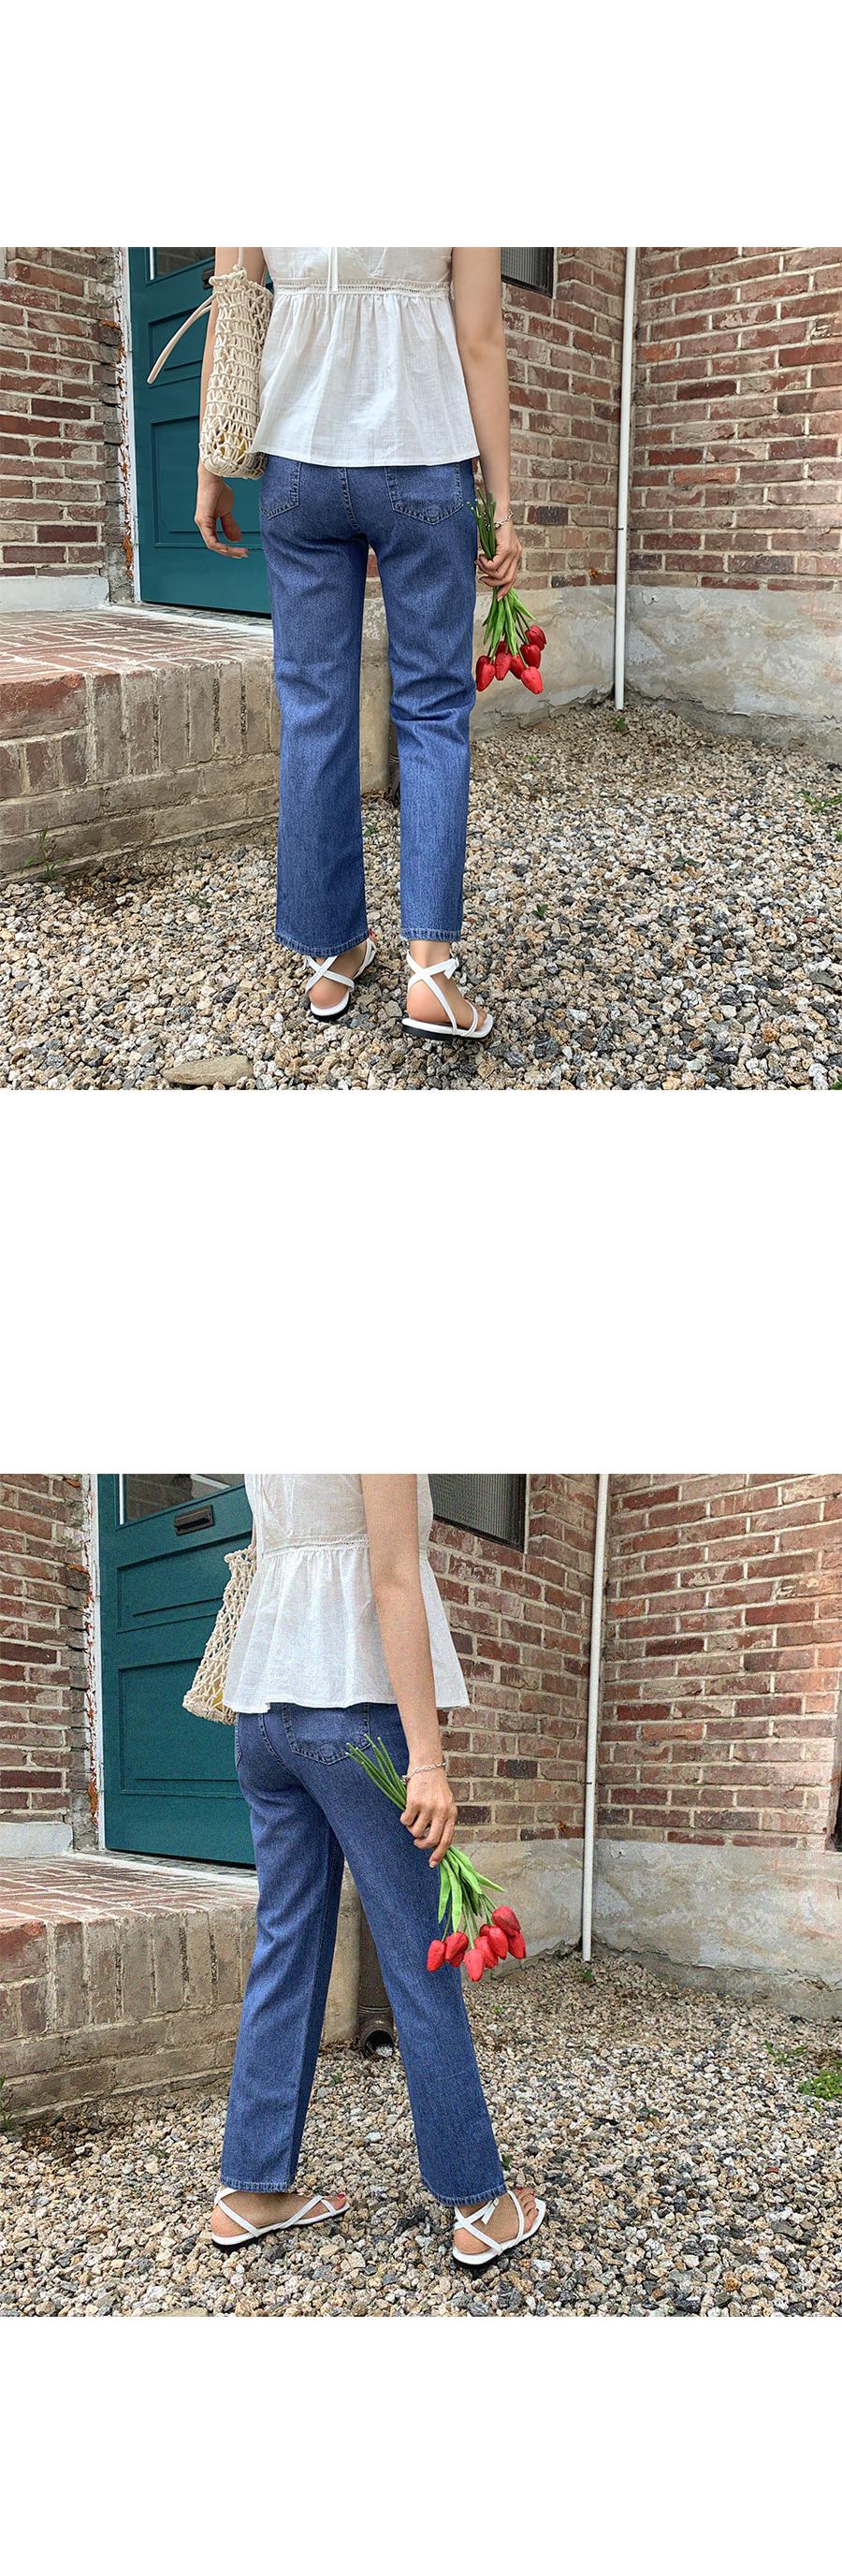 Nika Linen Nashi blouse